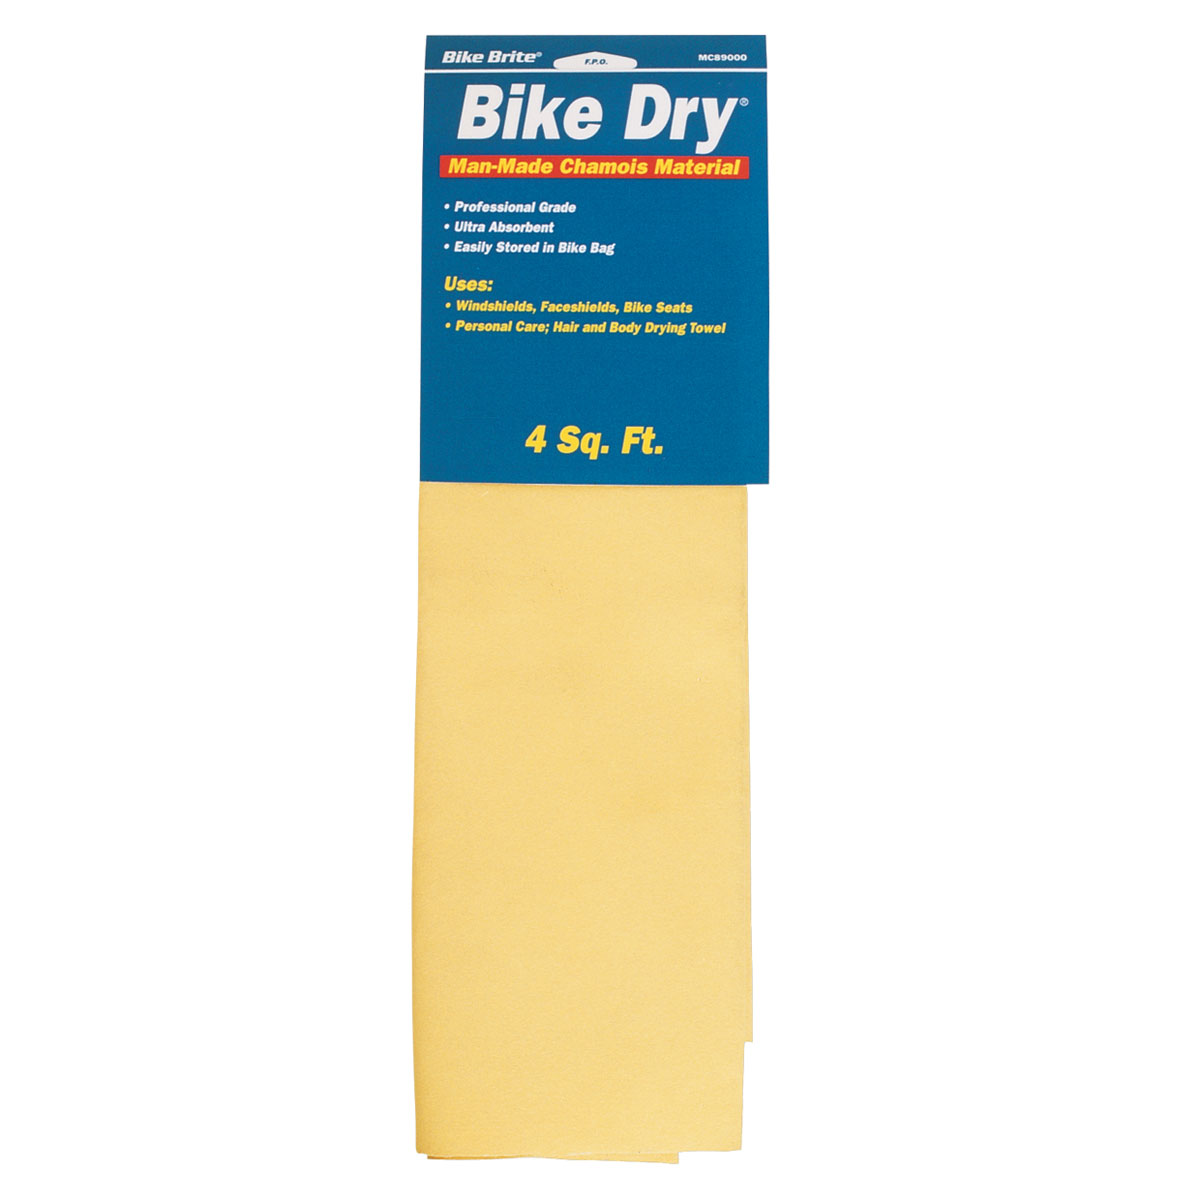 Bike Dry Man-Made Chamois